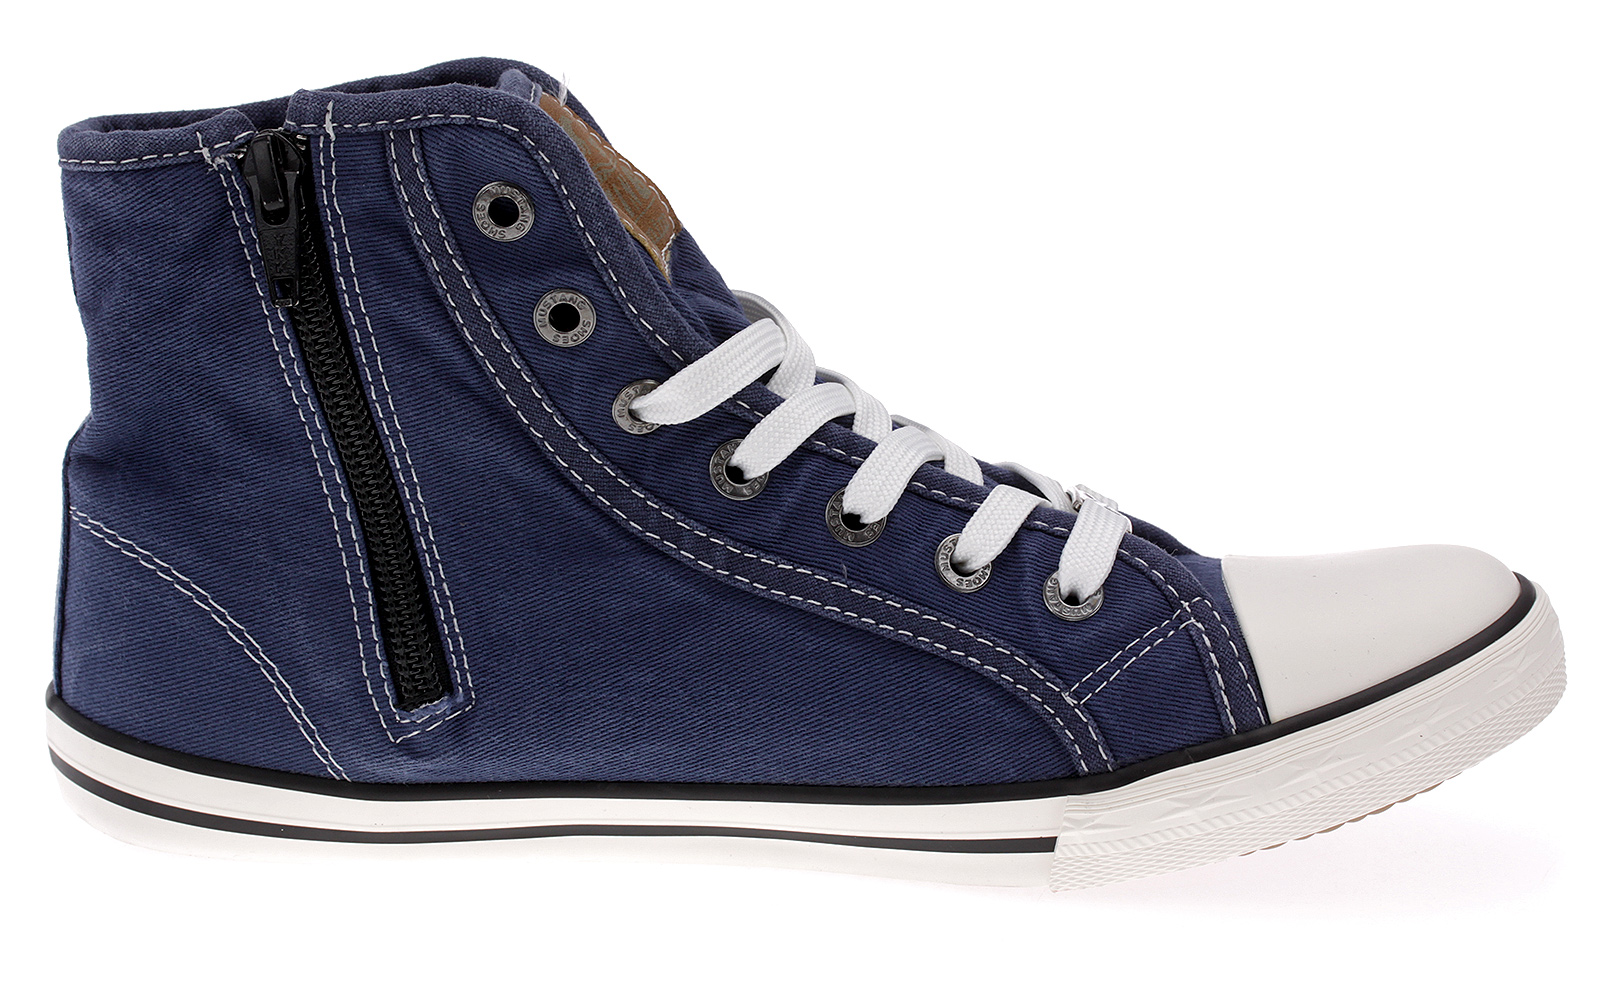 Mustang High Top Sneakers Sportschuhe Stoffschuhe Freizeitschuhe841. jeansblau